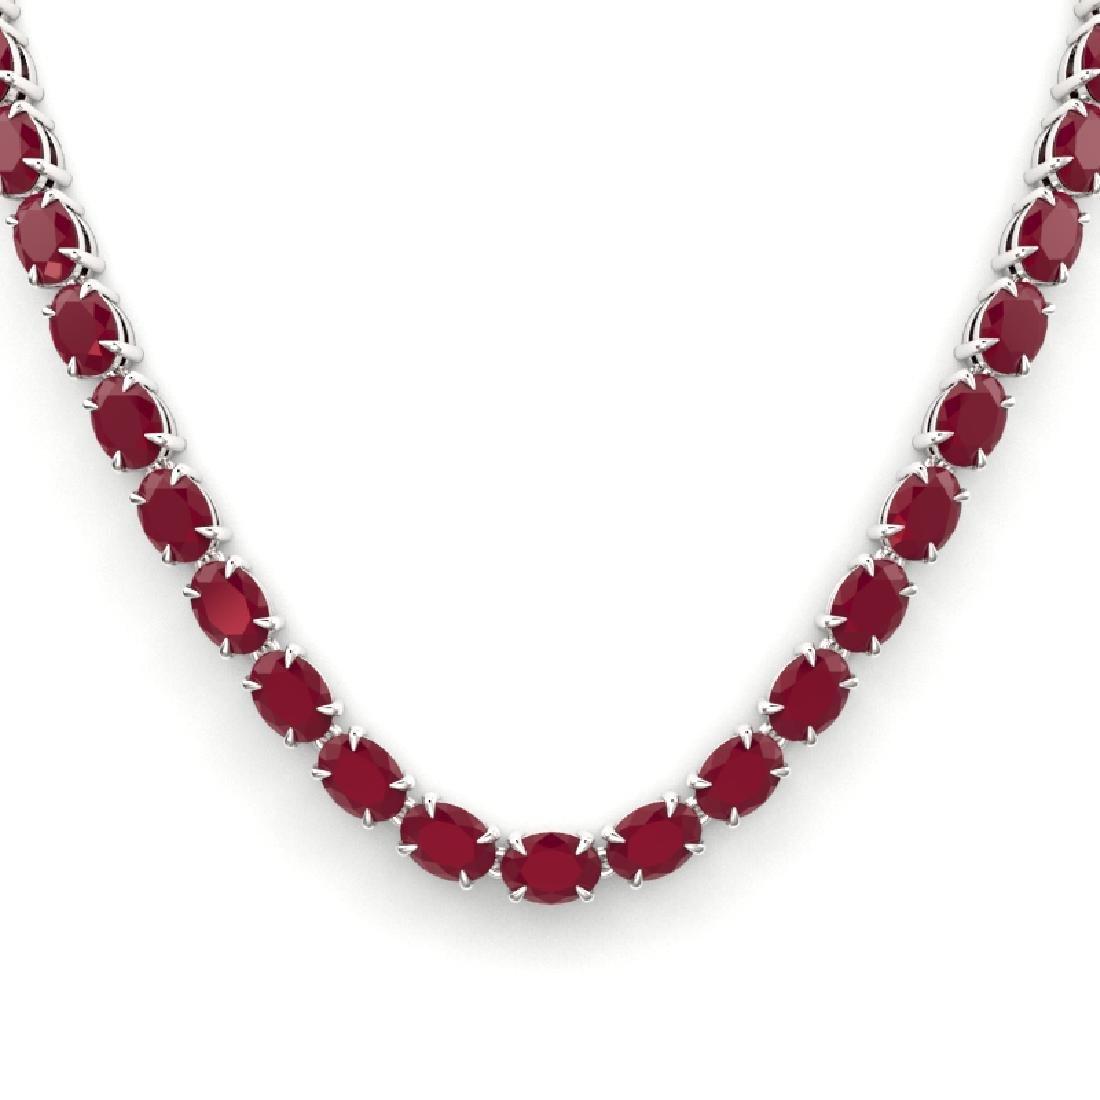 68 CTW Ruby Eternity Designer Inspired Tennis Necklace - 2